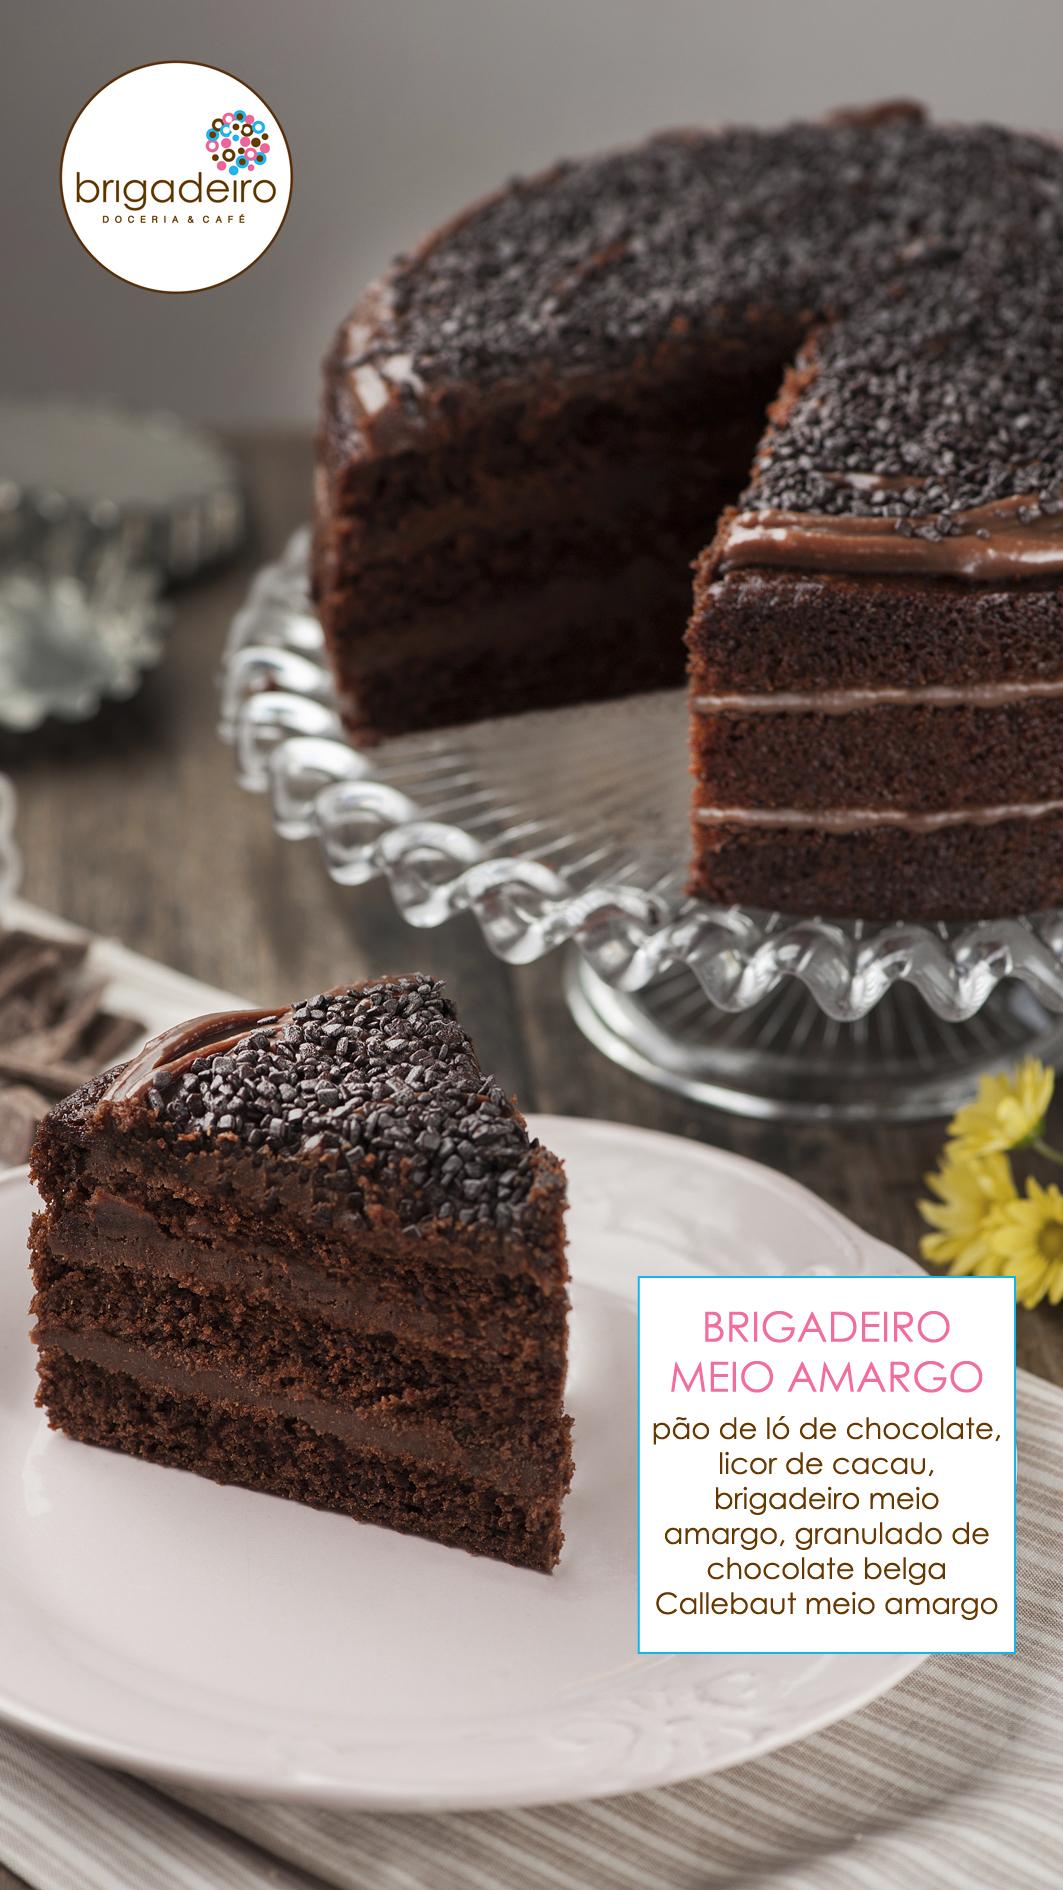 02 - BOLO BRIGADEIRO MEIO AMARGO